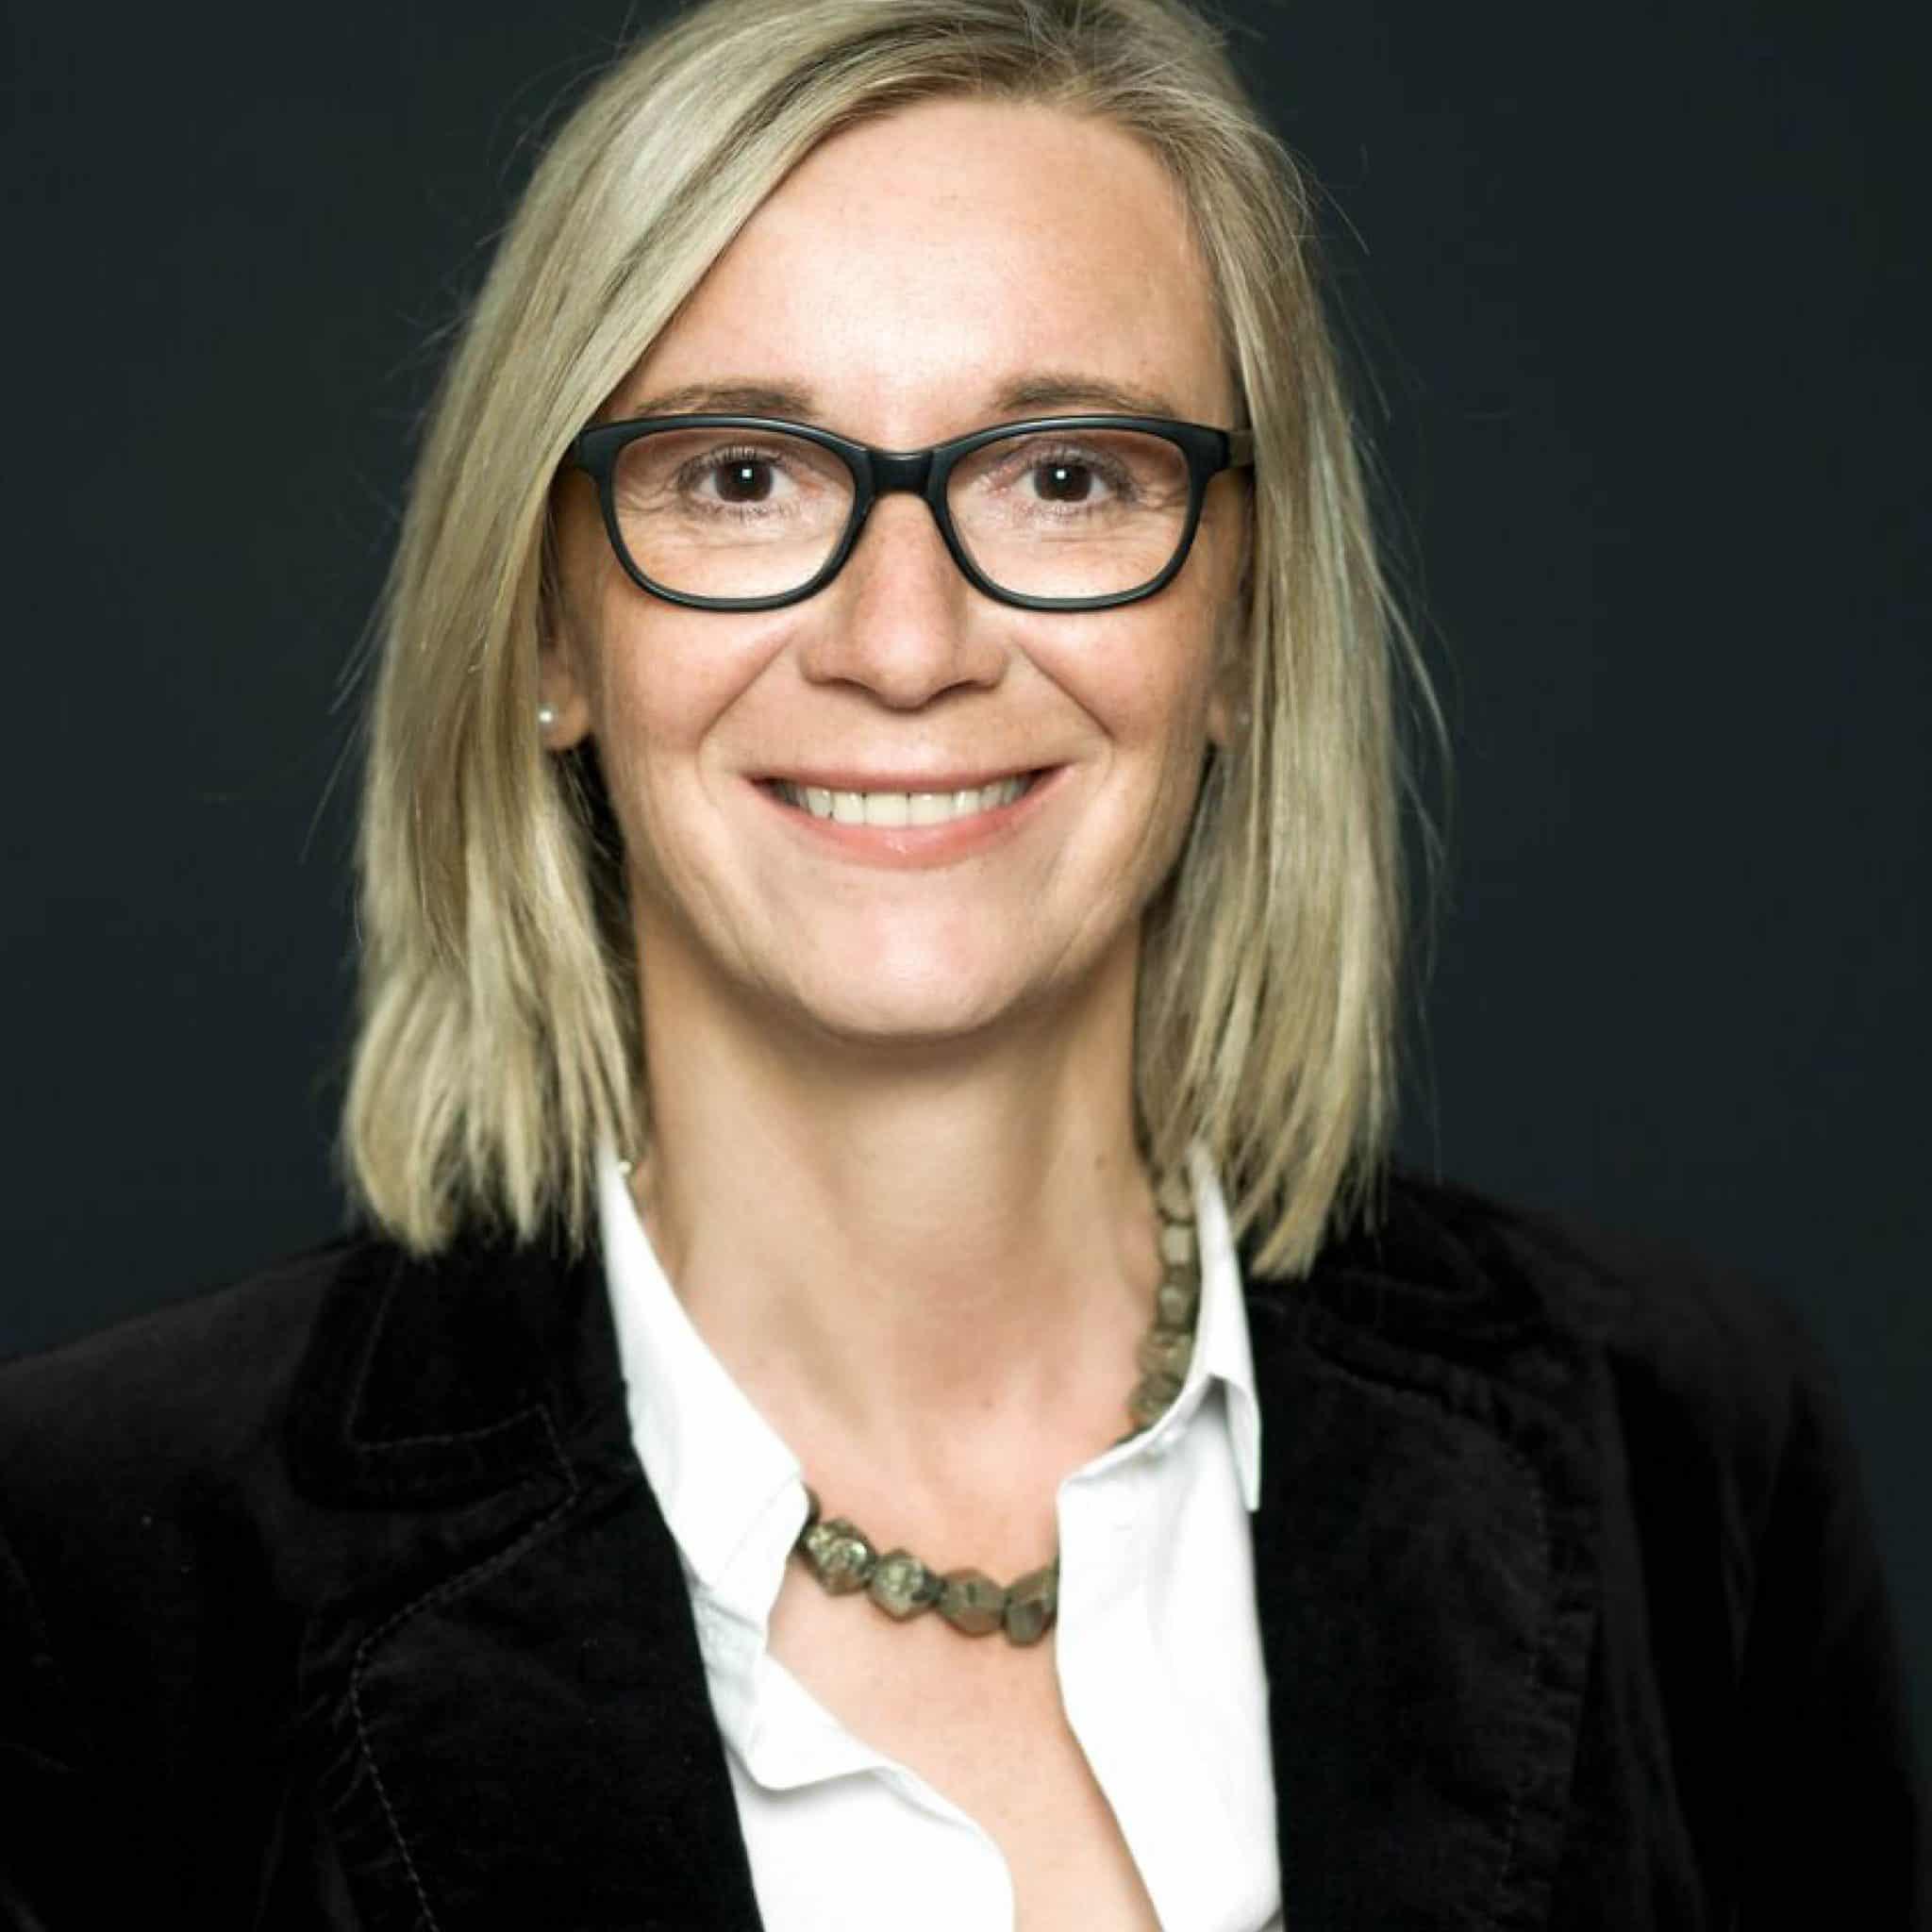 Monika Kraus-Wildegger